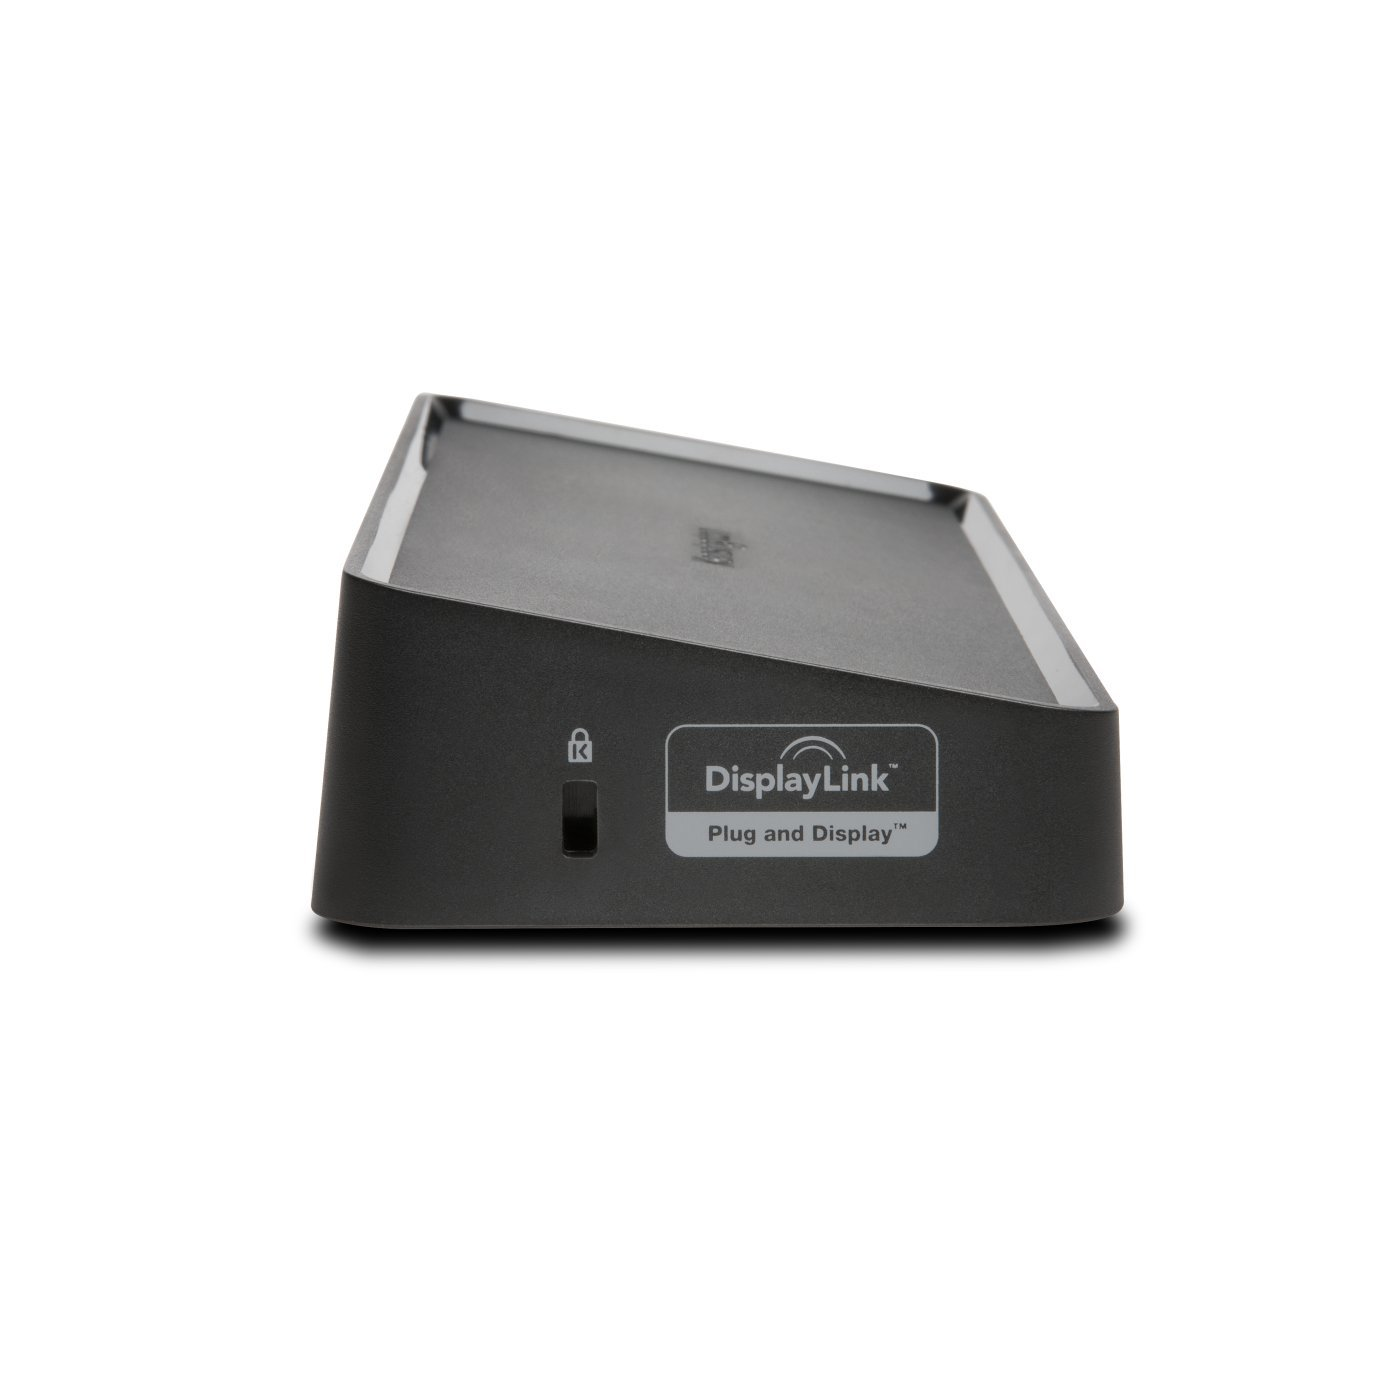 Kensington SD3600 USB 3.0 Dual Docking Station (Horizontal Style) image